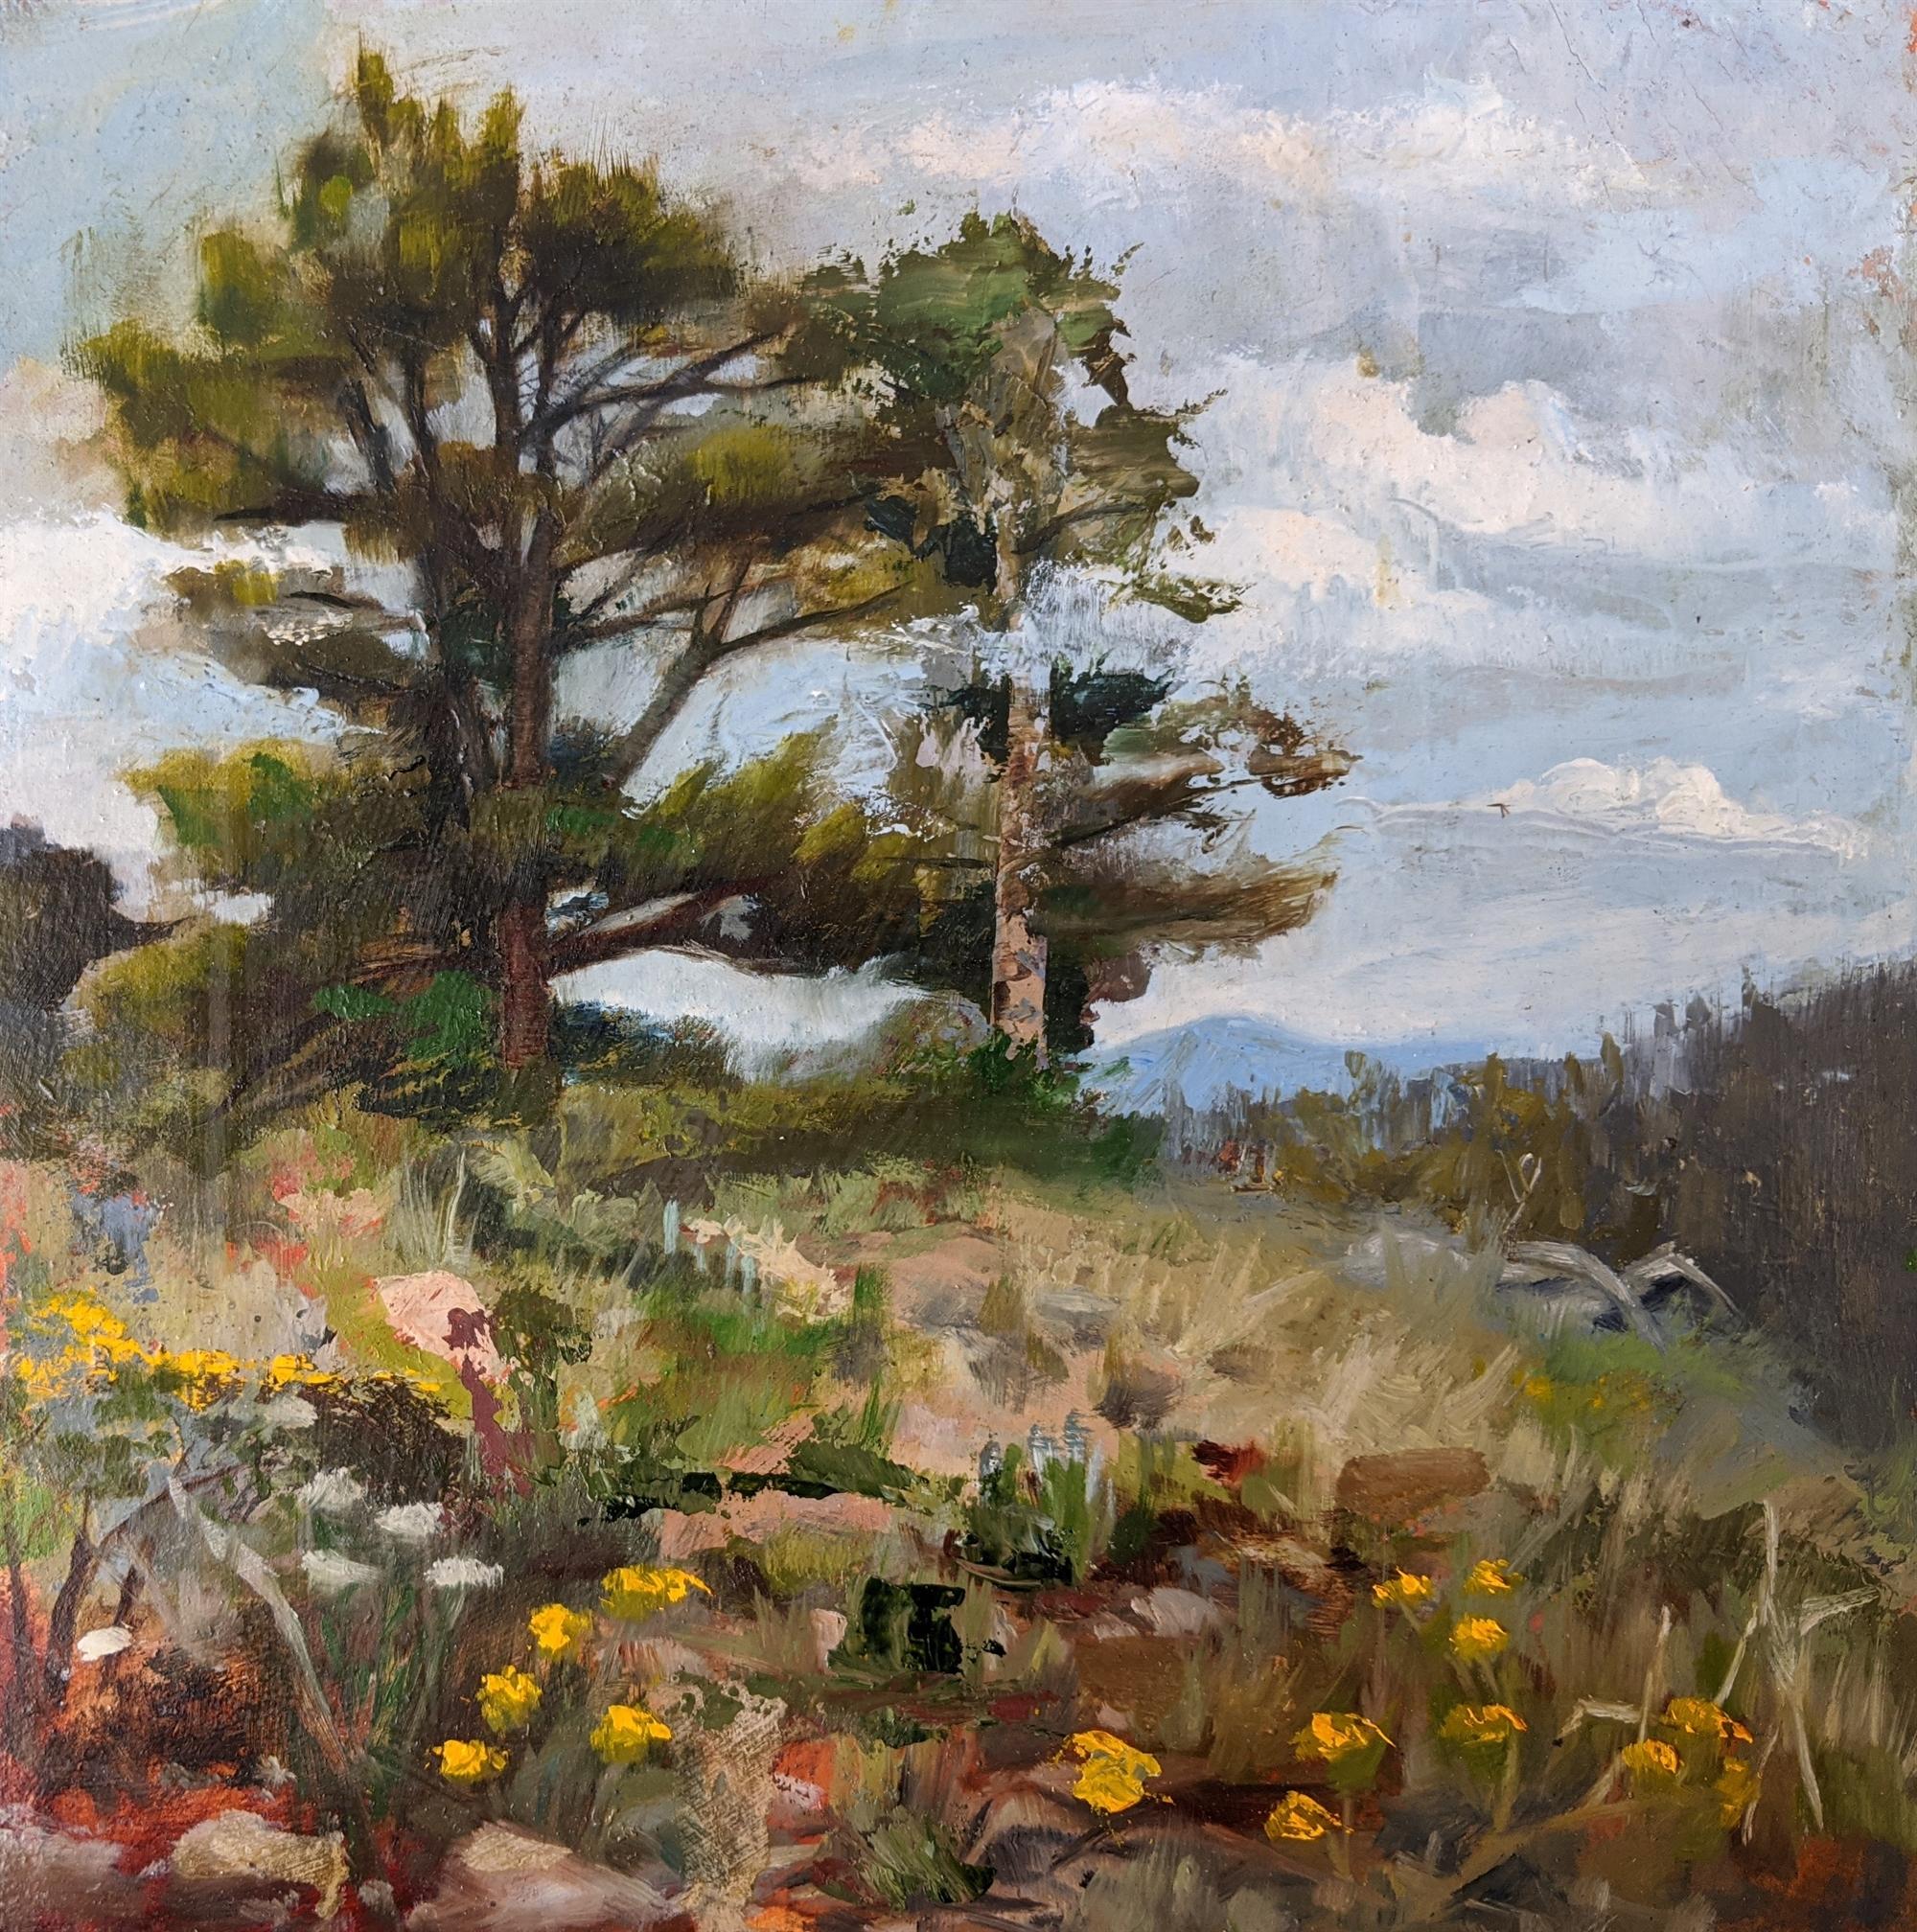 Landscape I by Caitlin Hurd